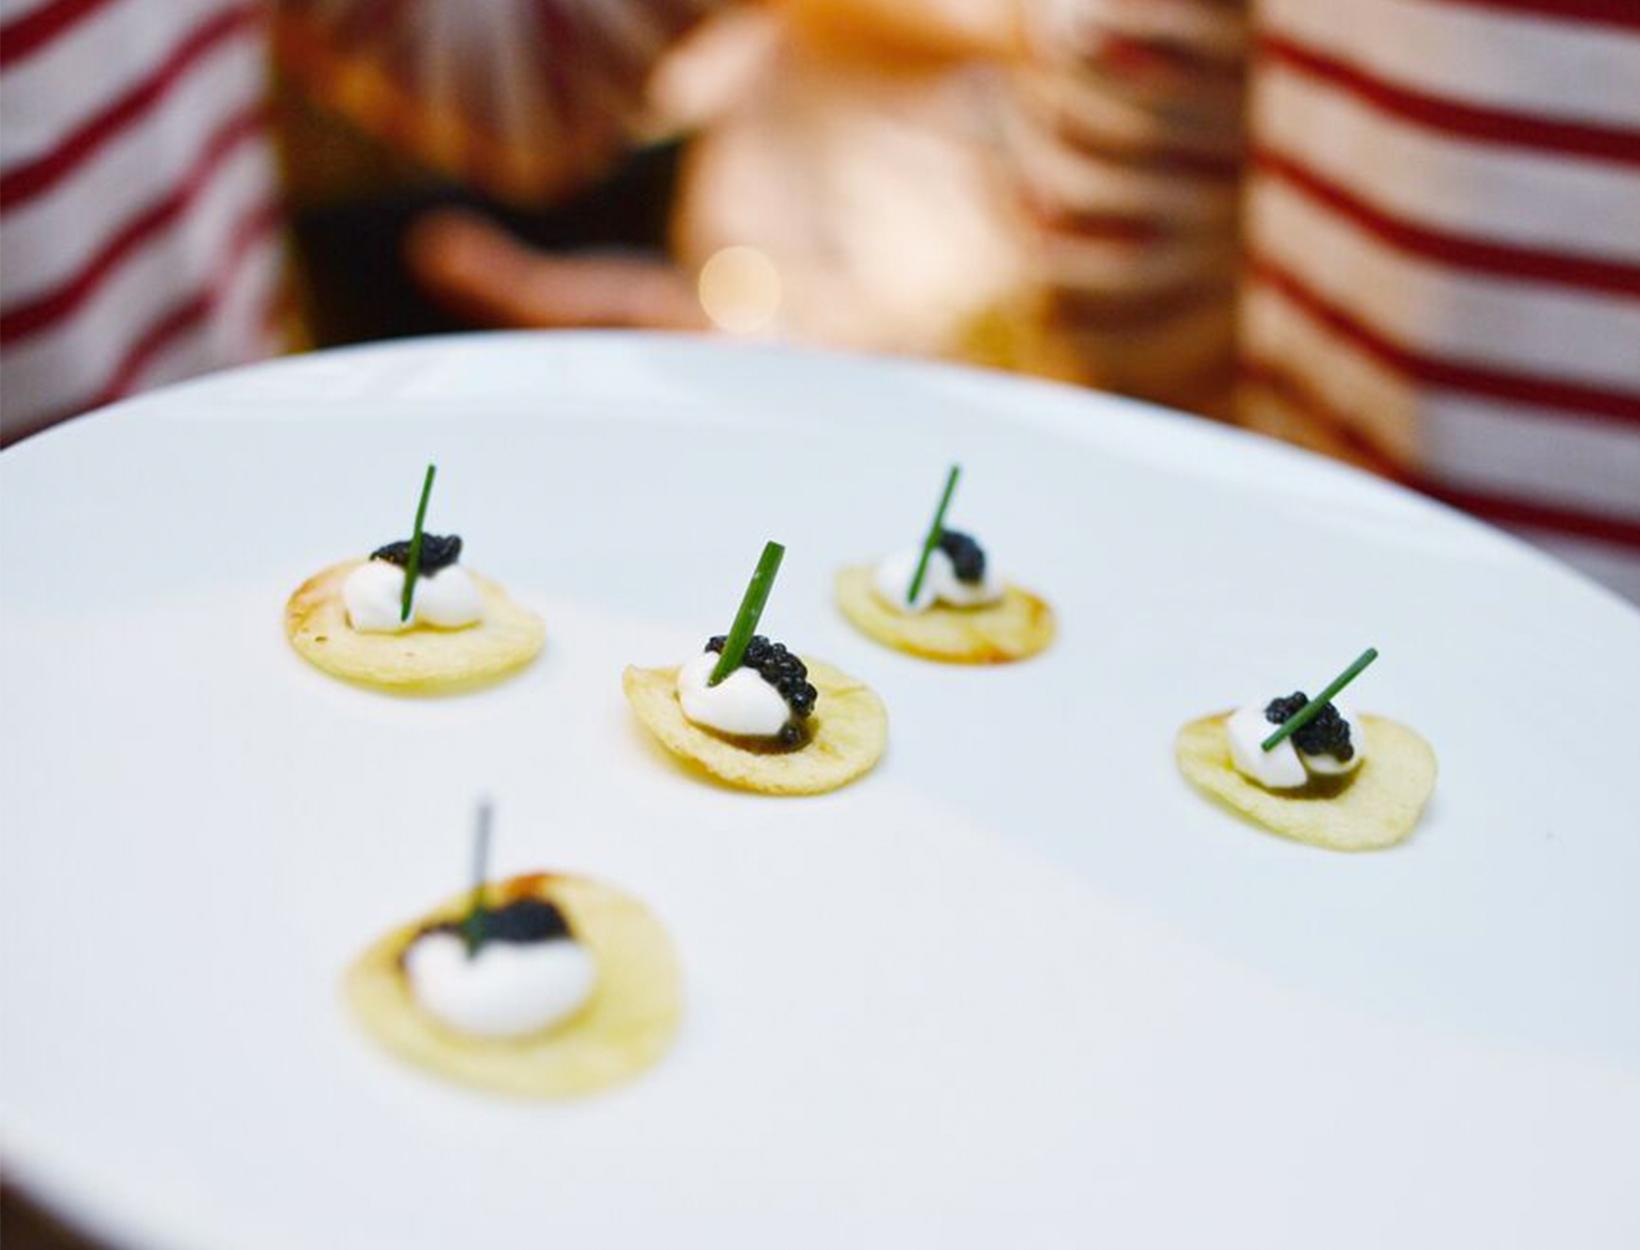 Potato Chips with Caviar and Crème Fraîche